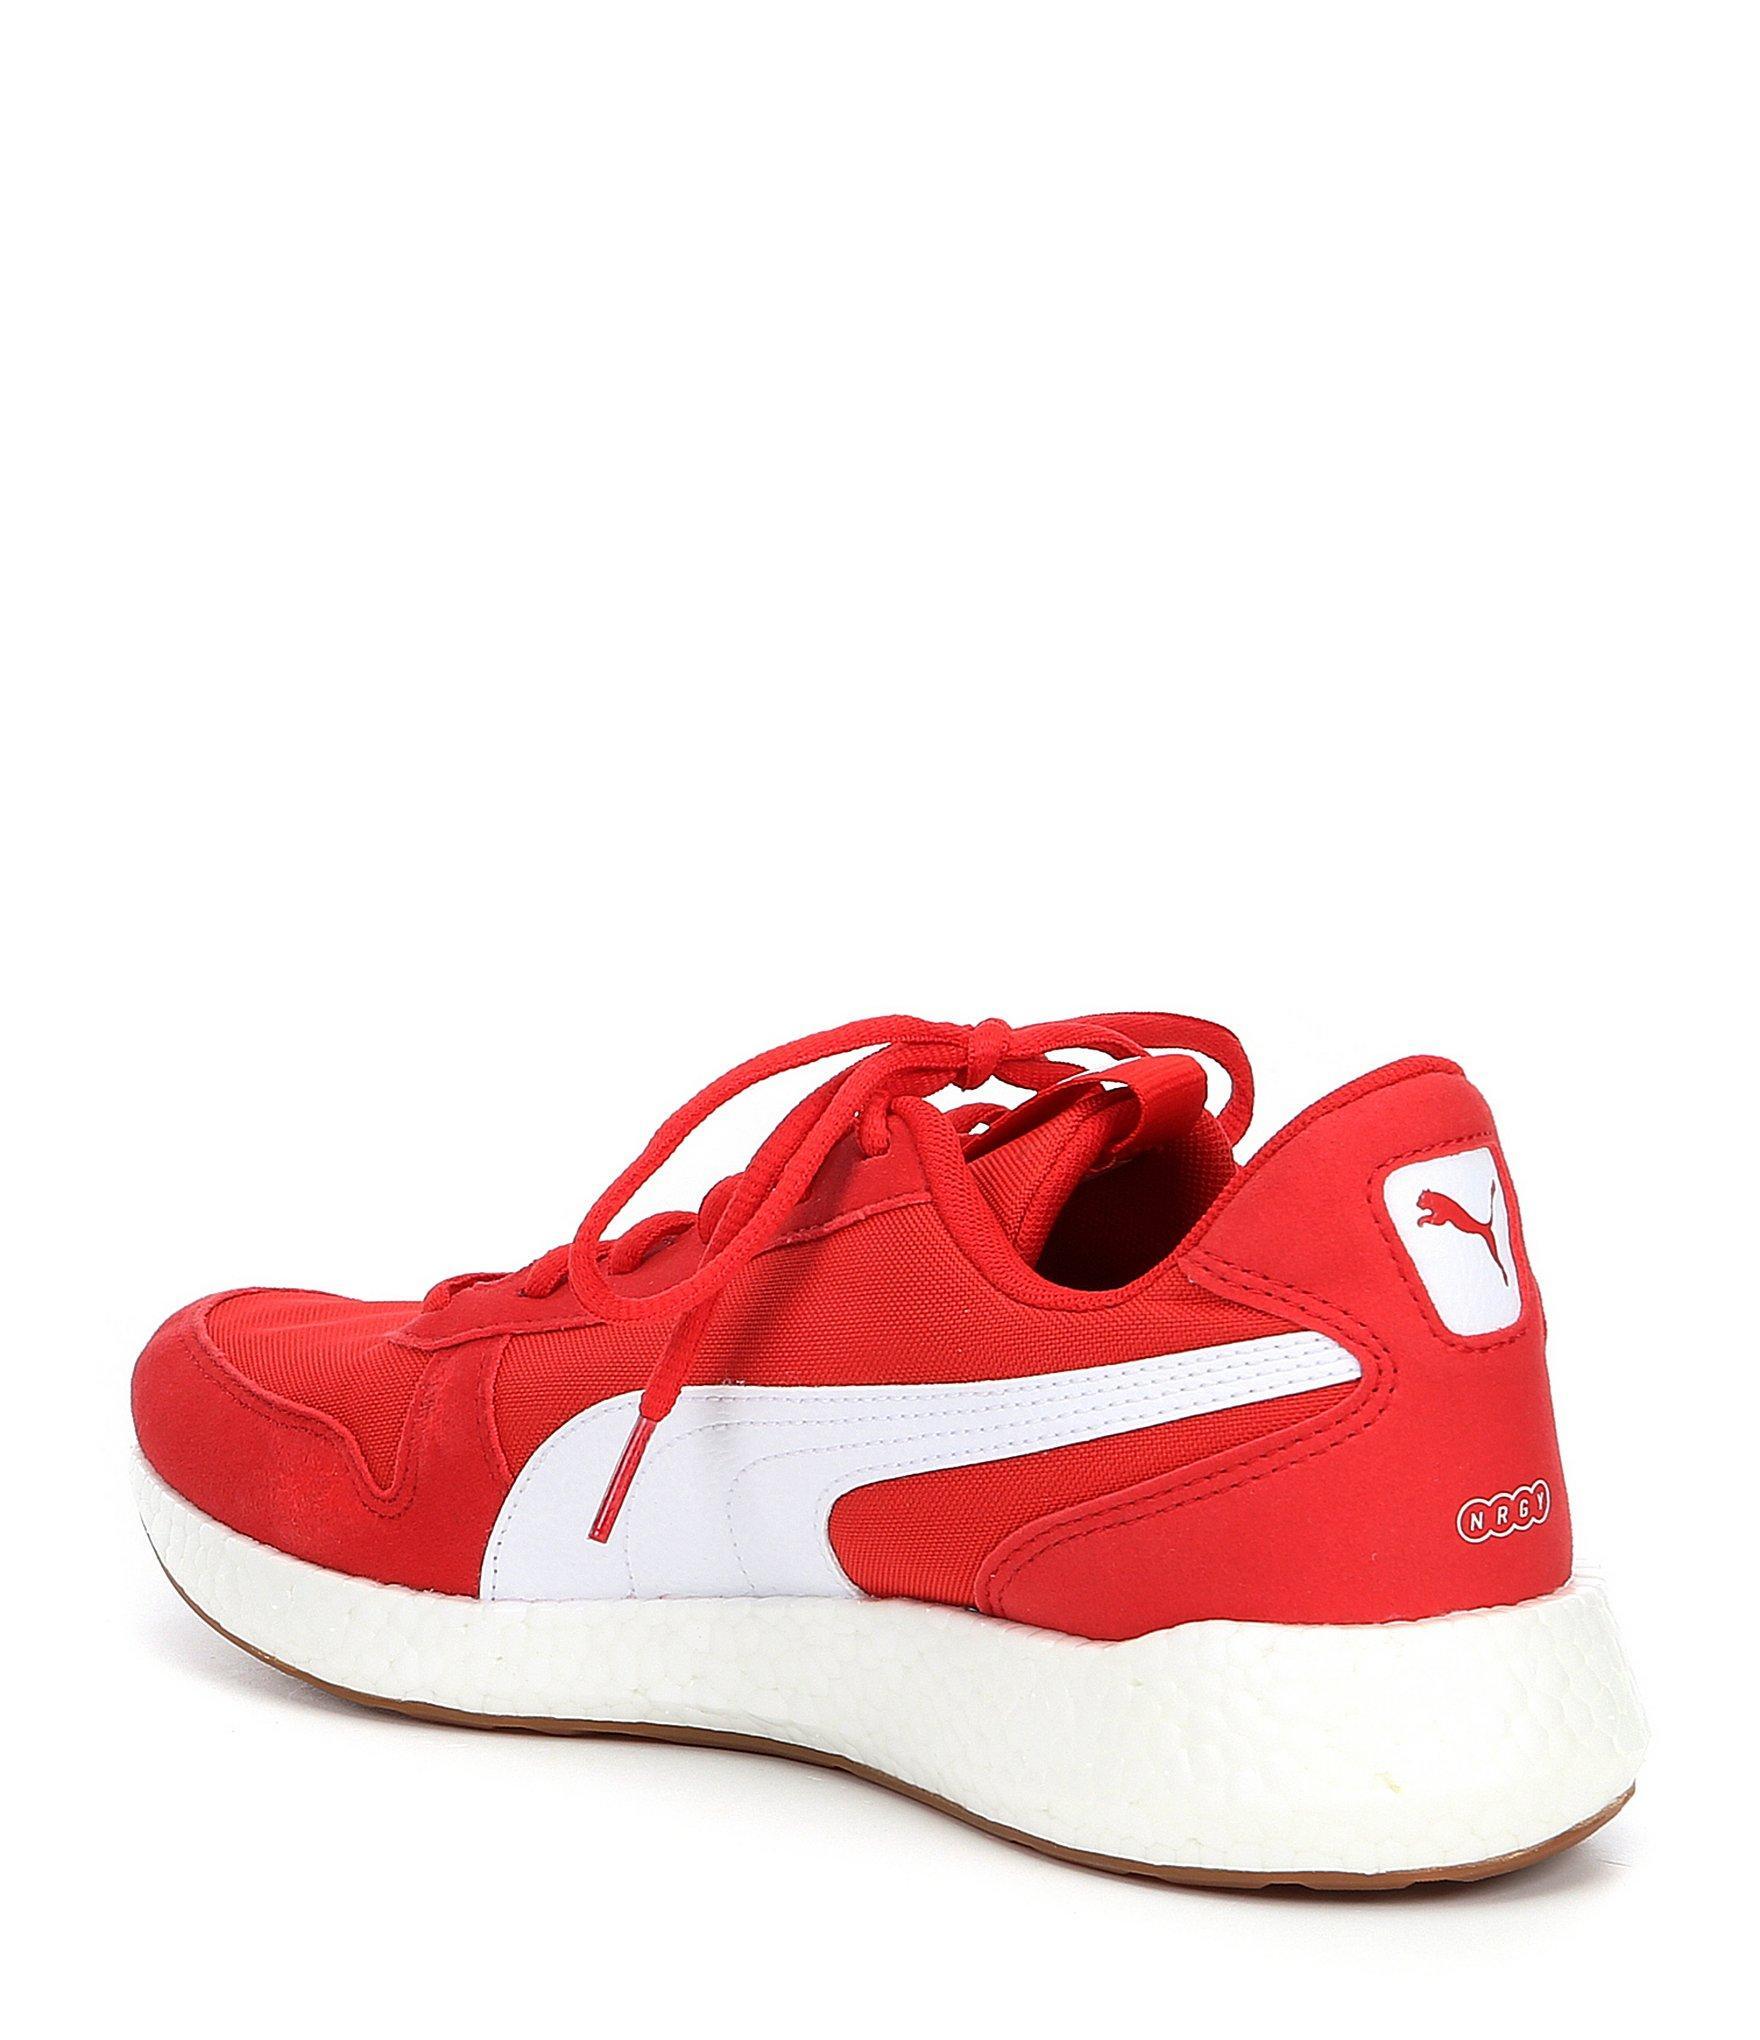 b8a768d2e05 PUMA - Red Men s Nrgy Neko Retro Sneaker for Men - Lyst. View fullscreen